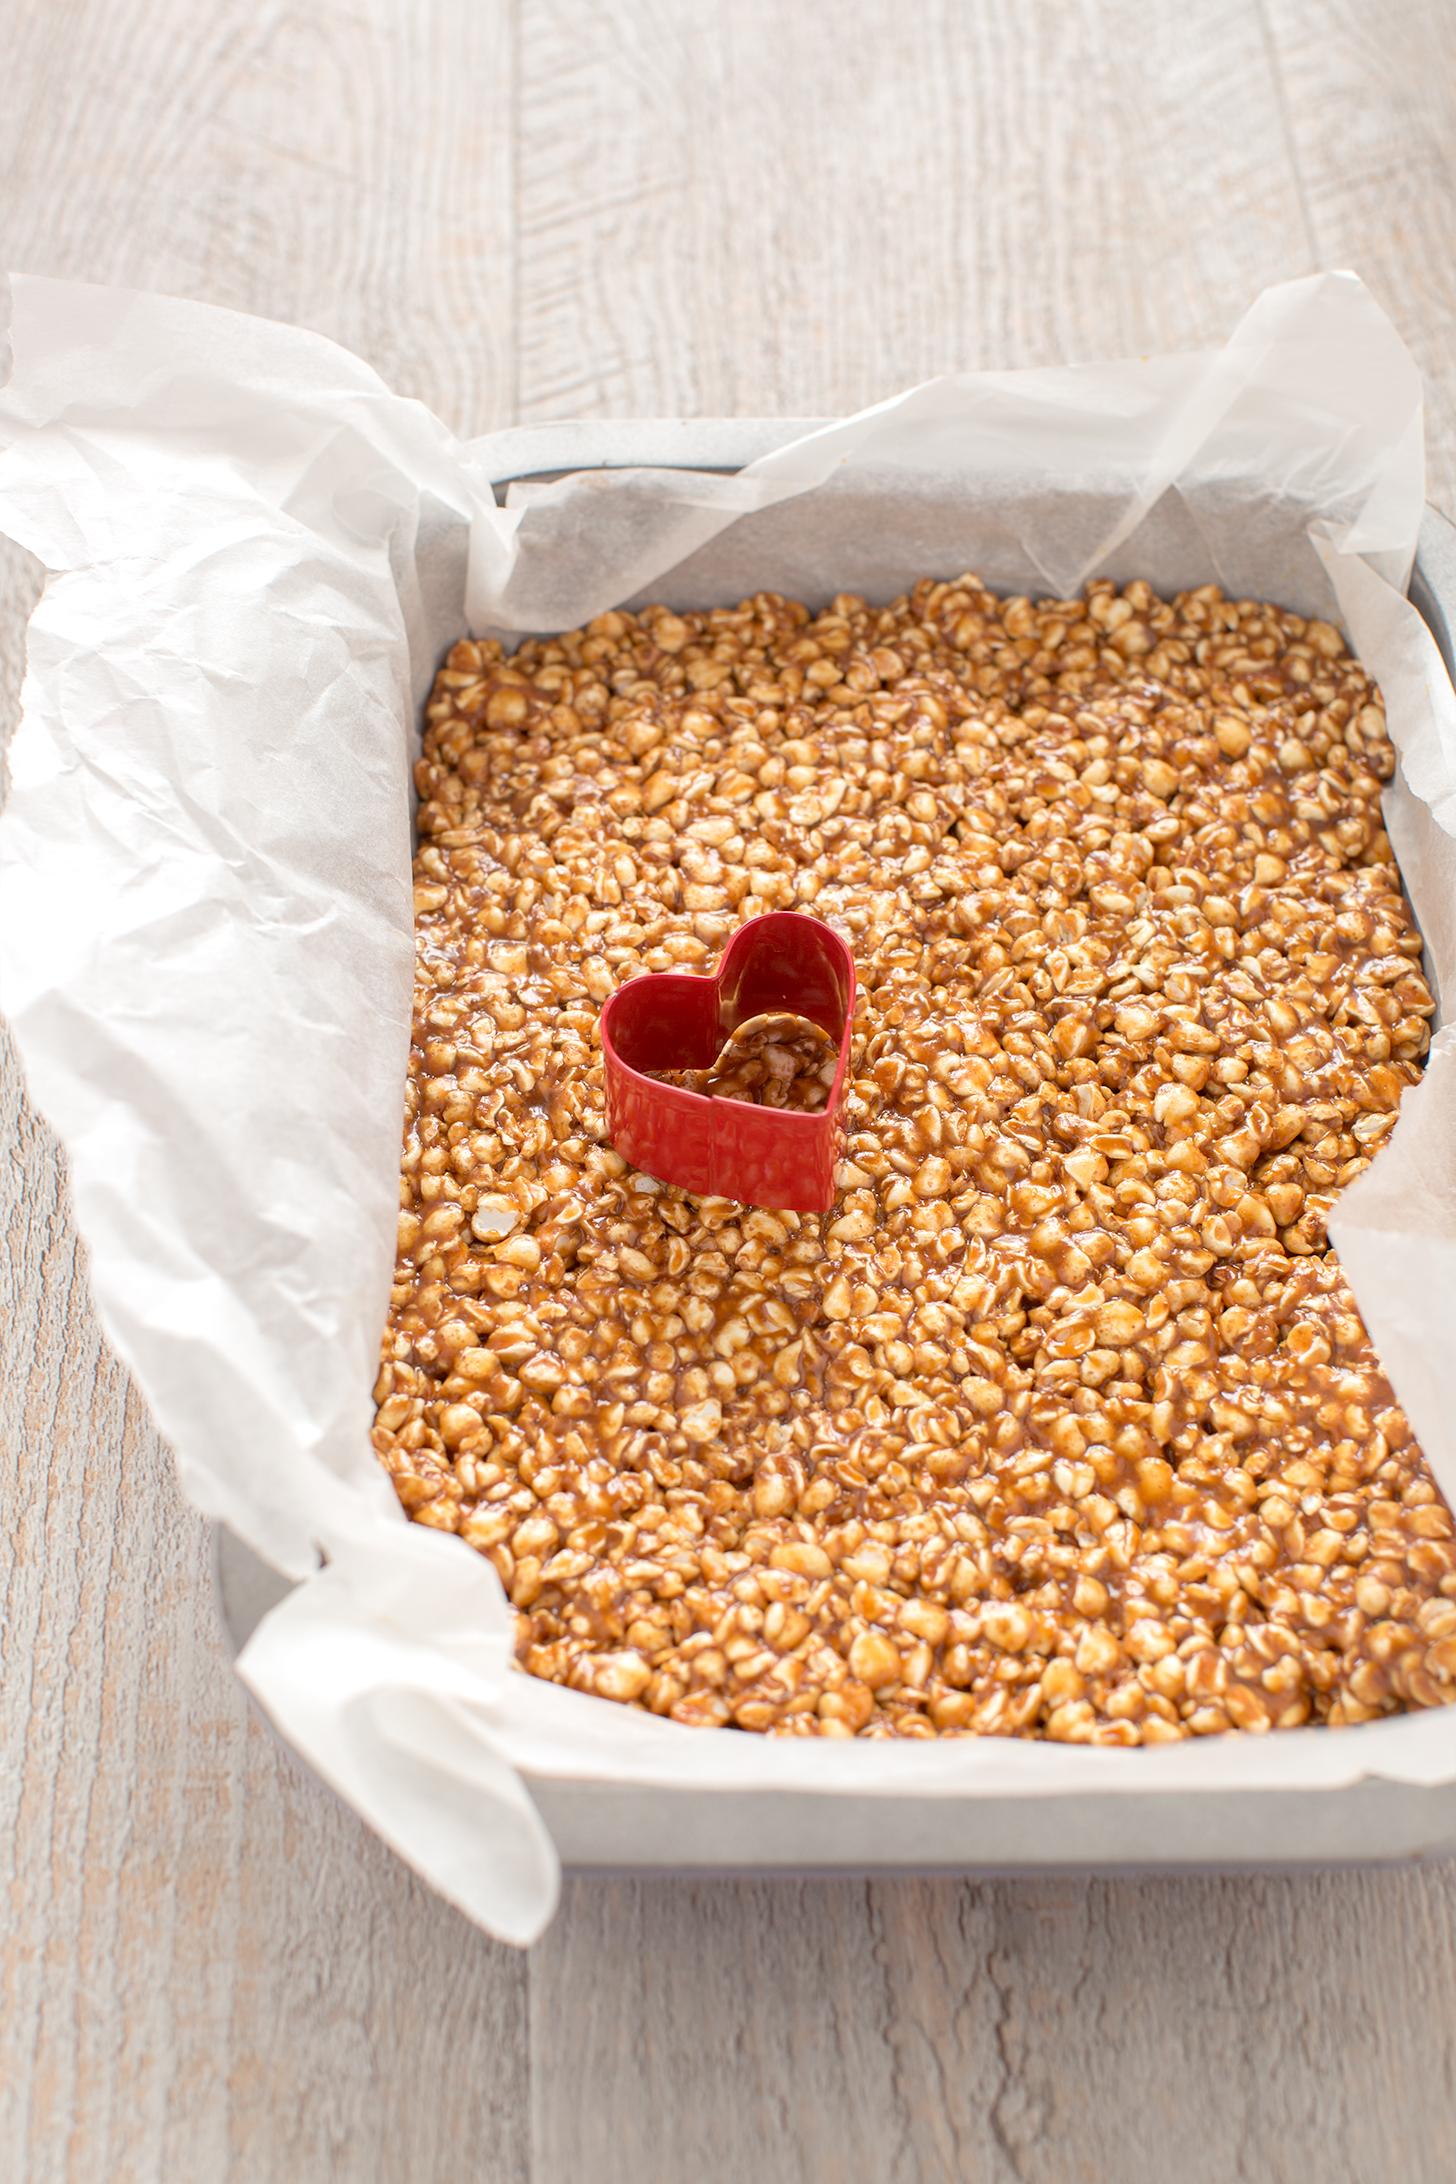 barrette energetiche grano saraceno e peanut butter | 3 ingredients vegan glutenfree puffed buckwheat peanut butter energy heart bars buckwheat recipe